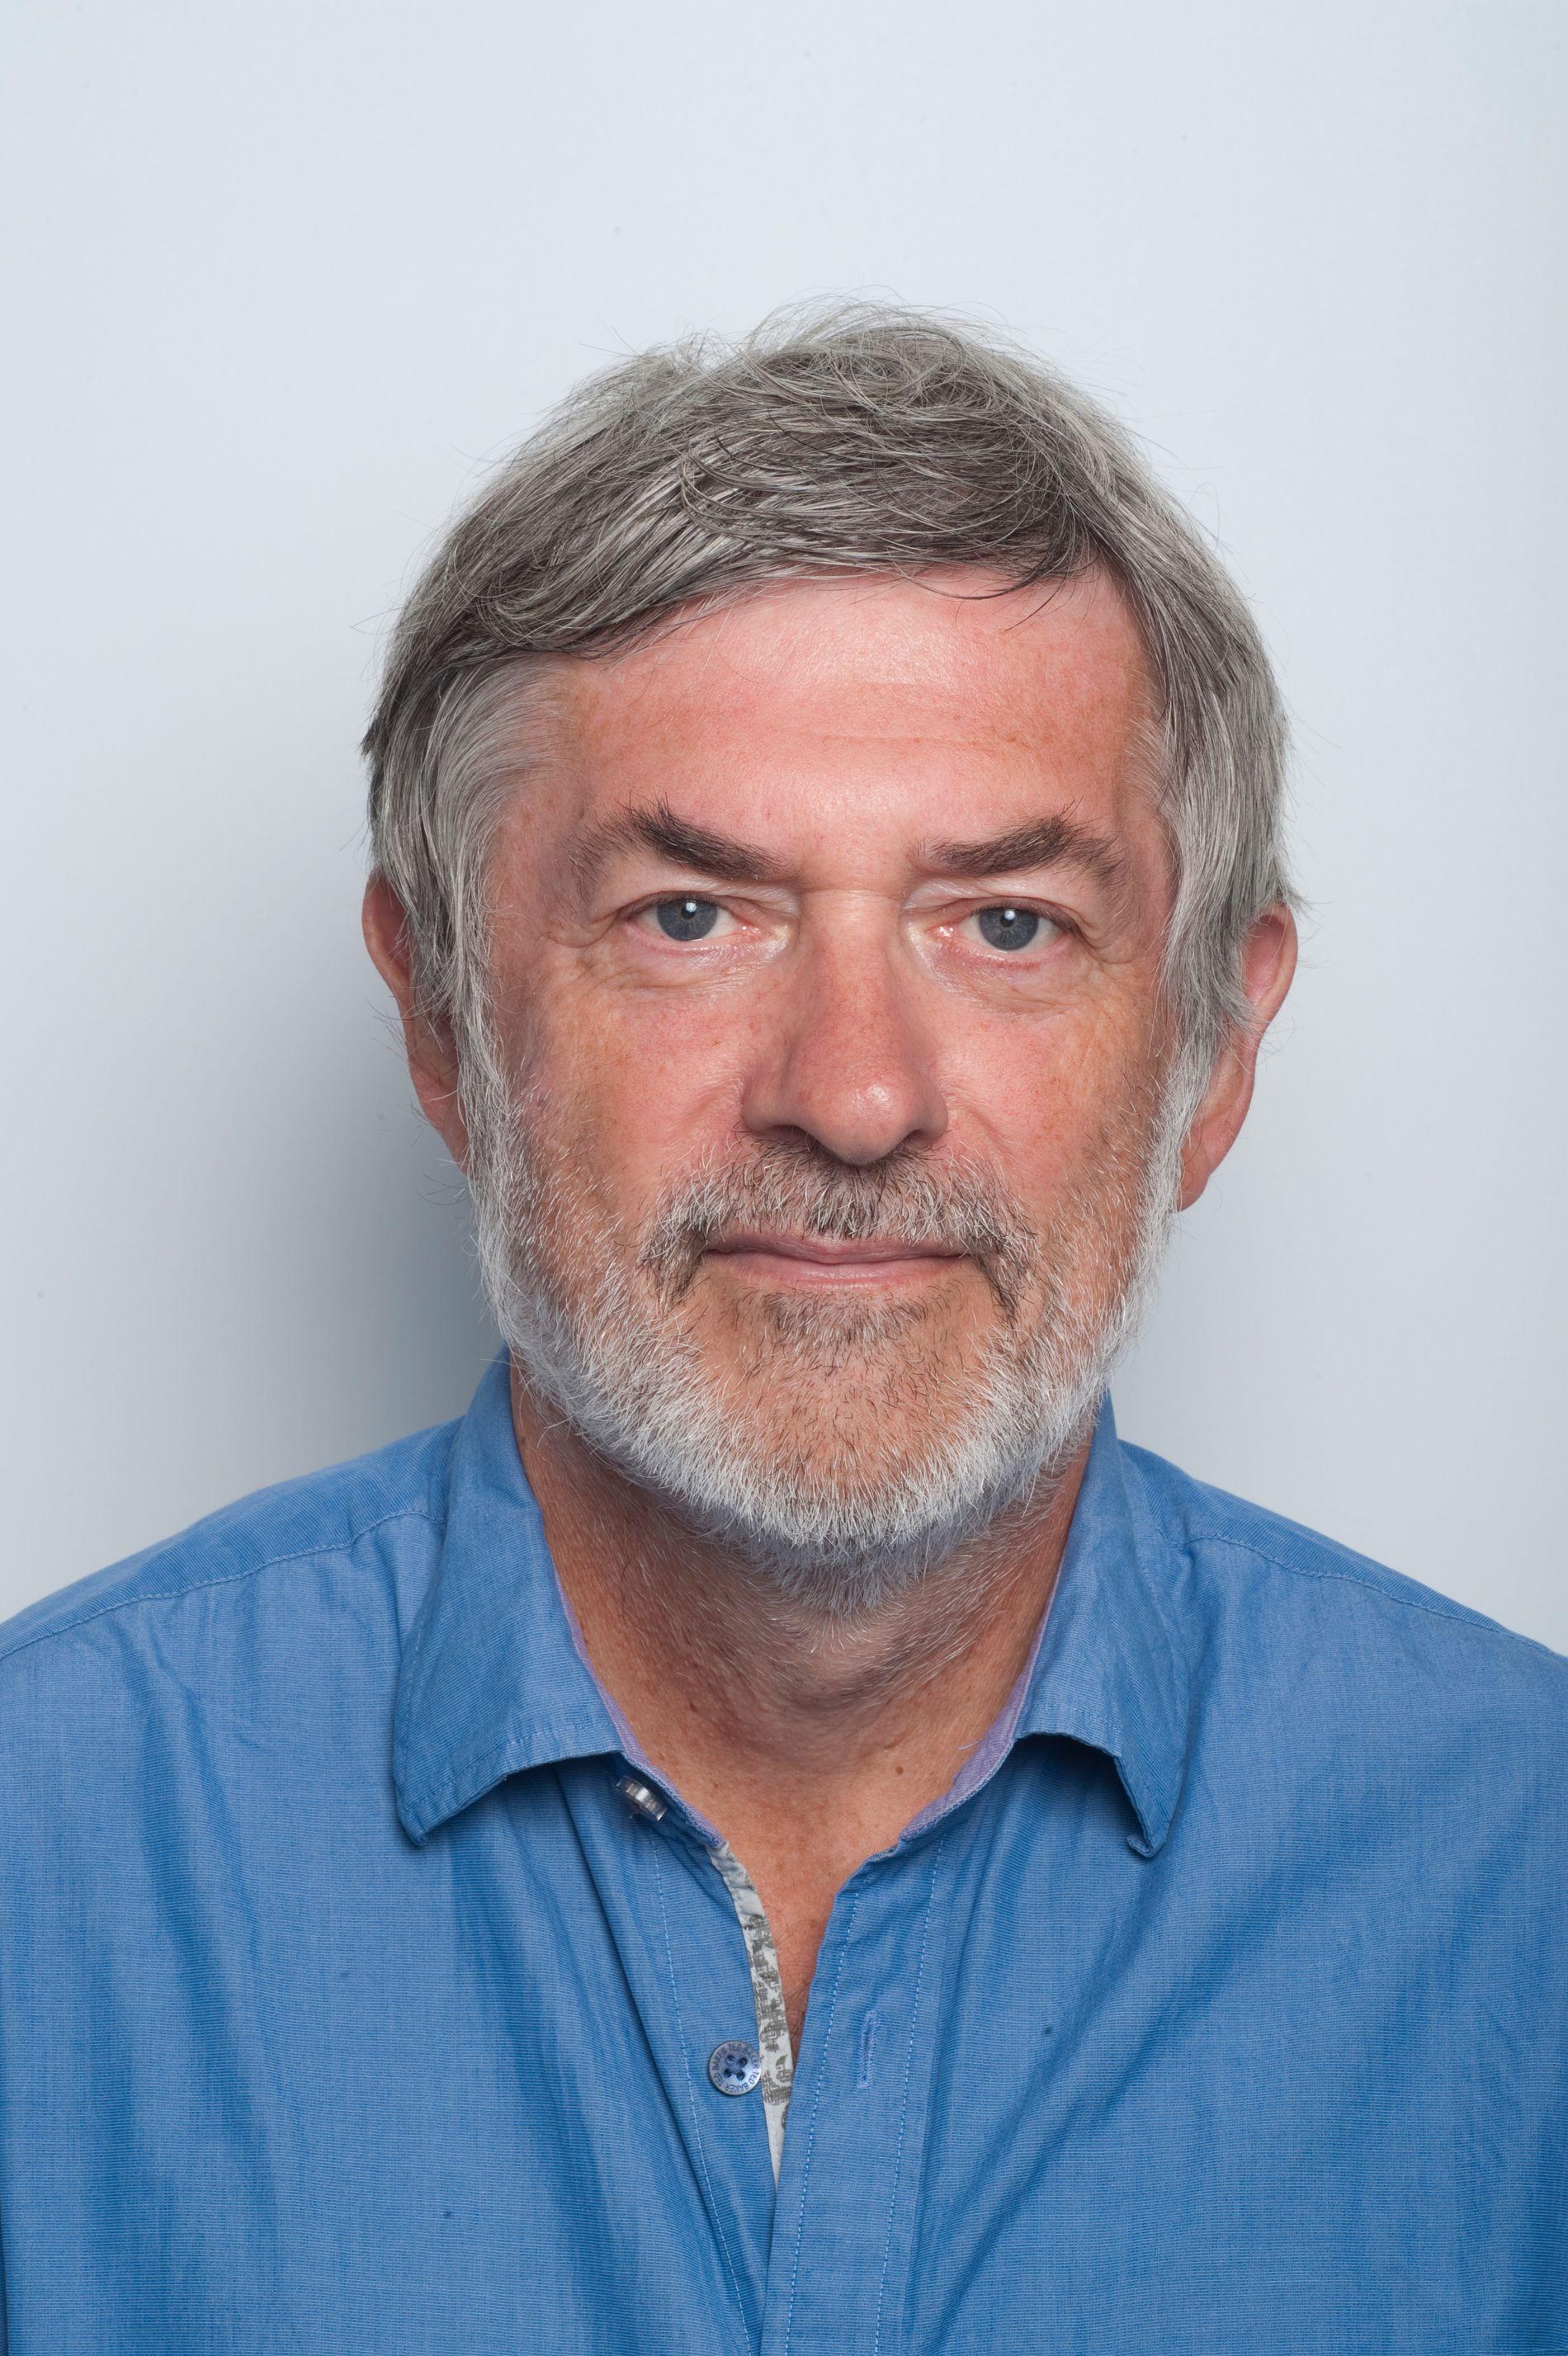 Gunnar M. Sørbø